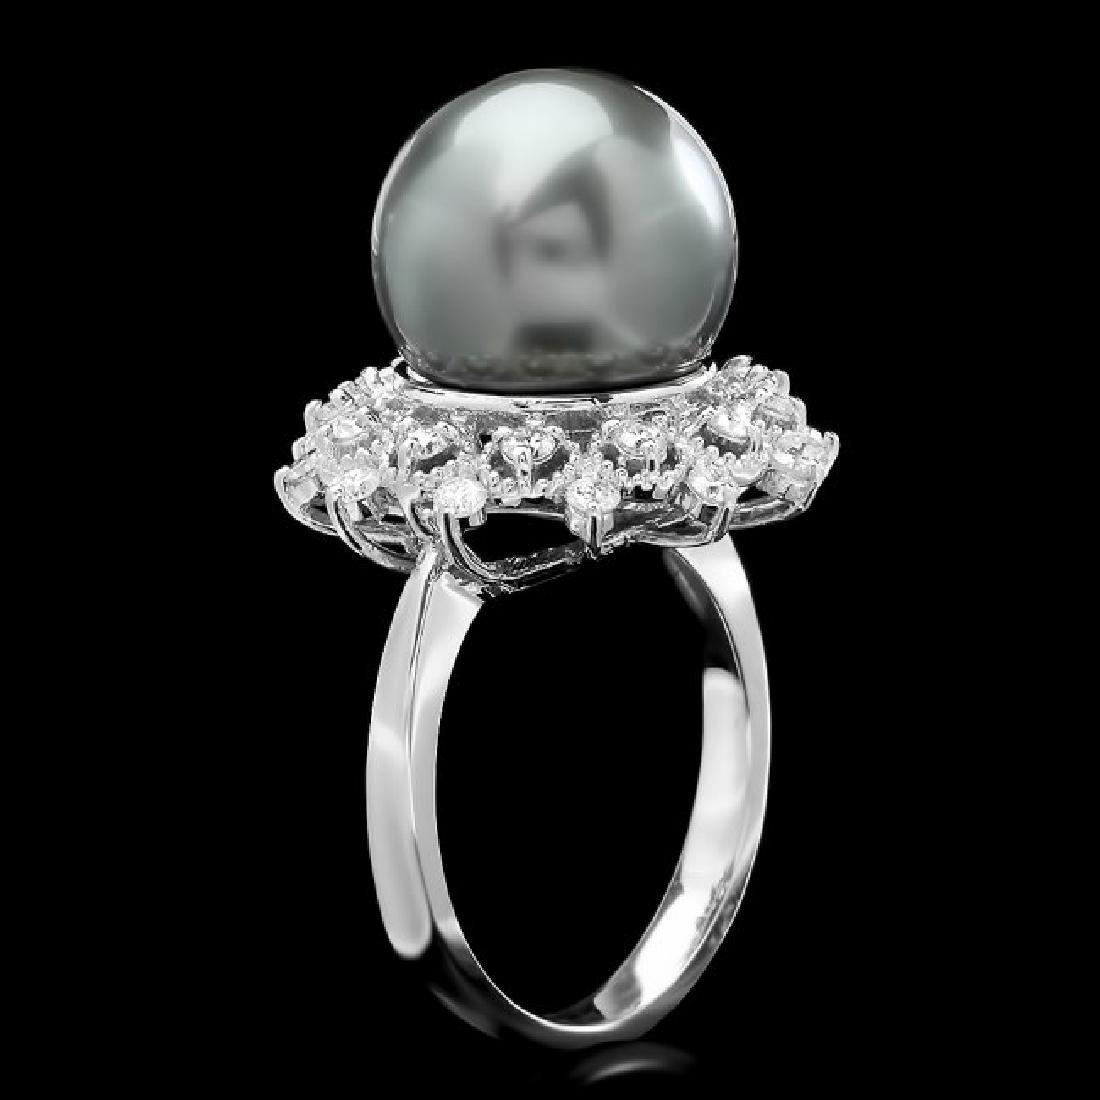 14k White Gold 12.5mm Pearl 0.60ct Diamond Ring - 2